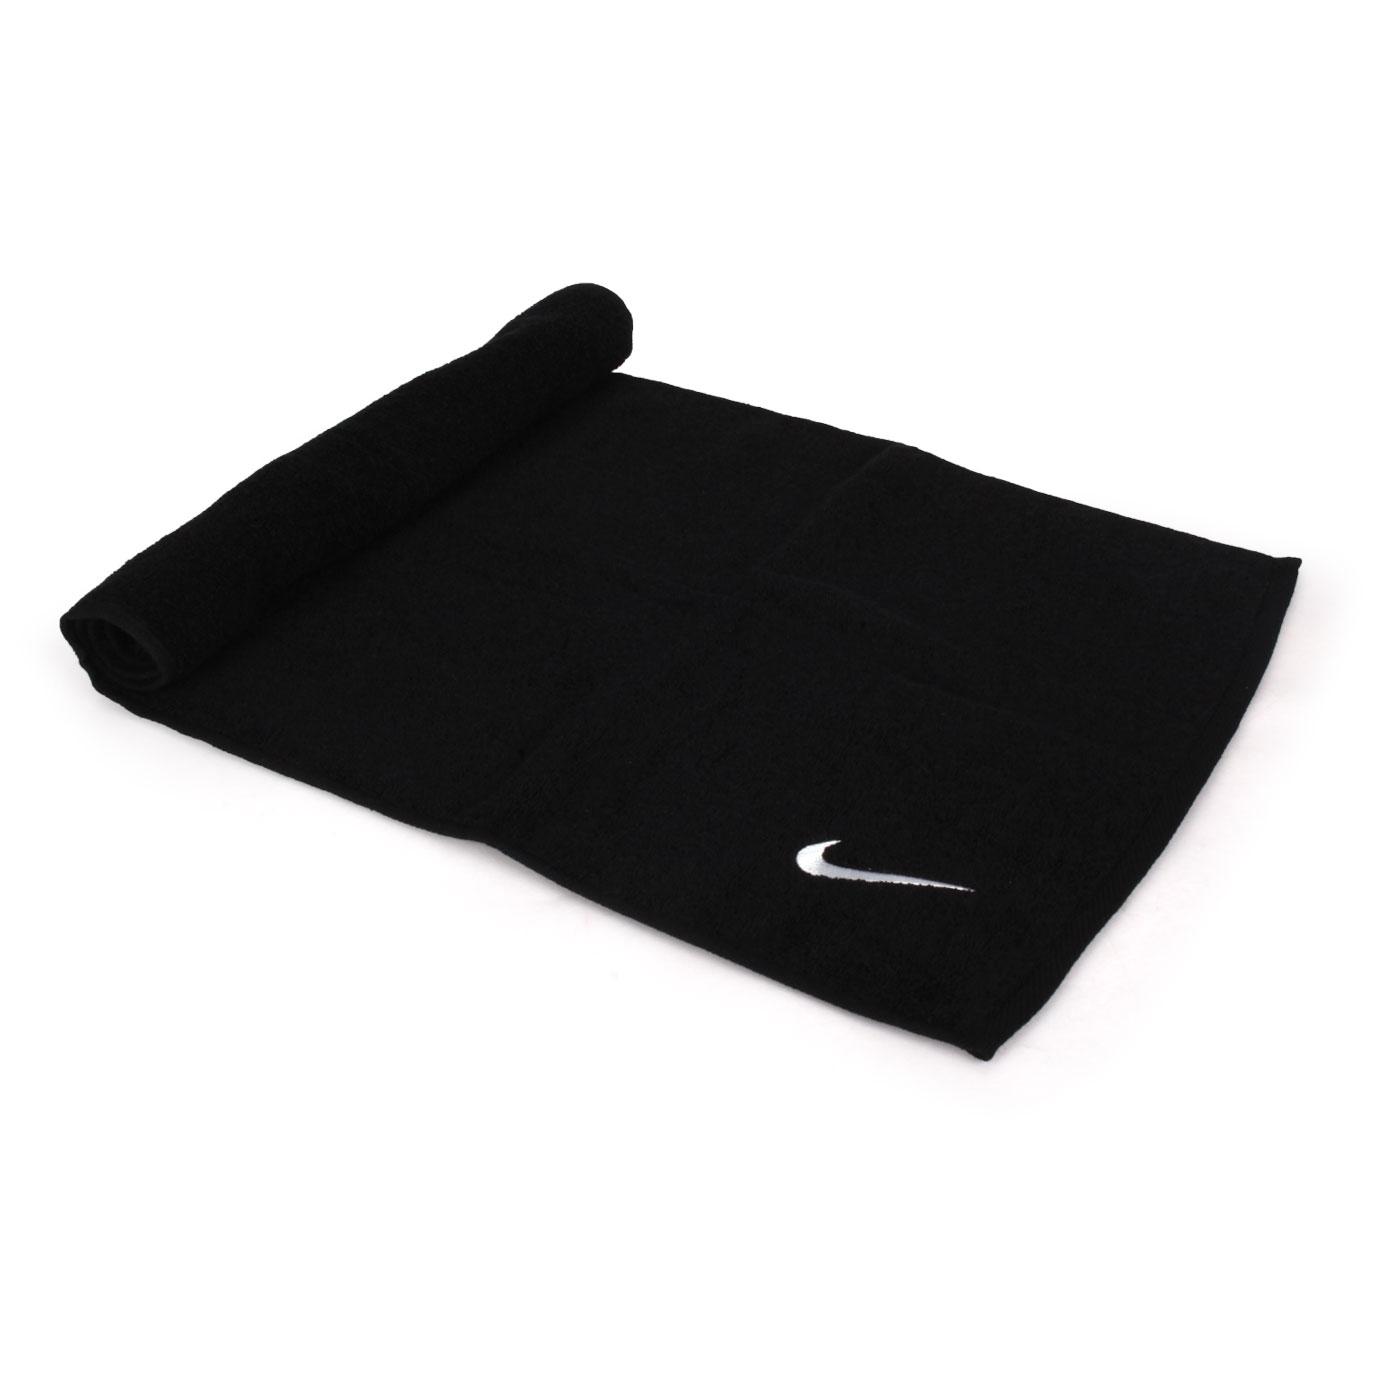 NIKE SOLID CORE長型毛巾 N1001540010NS - 黑白